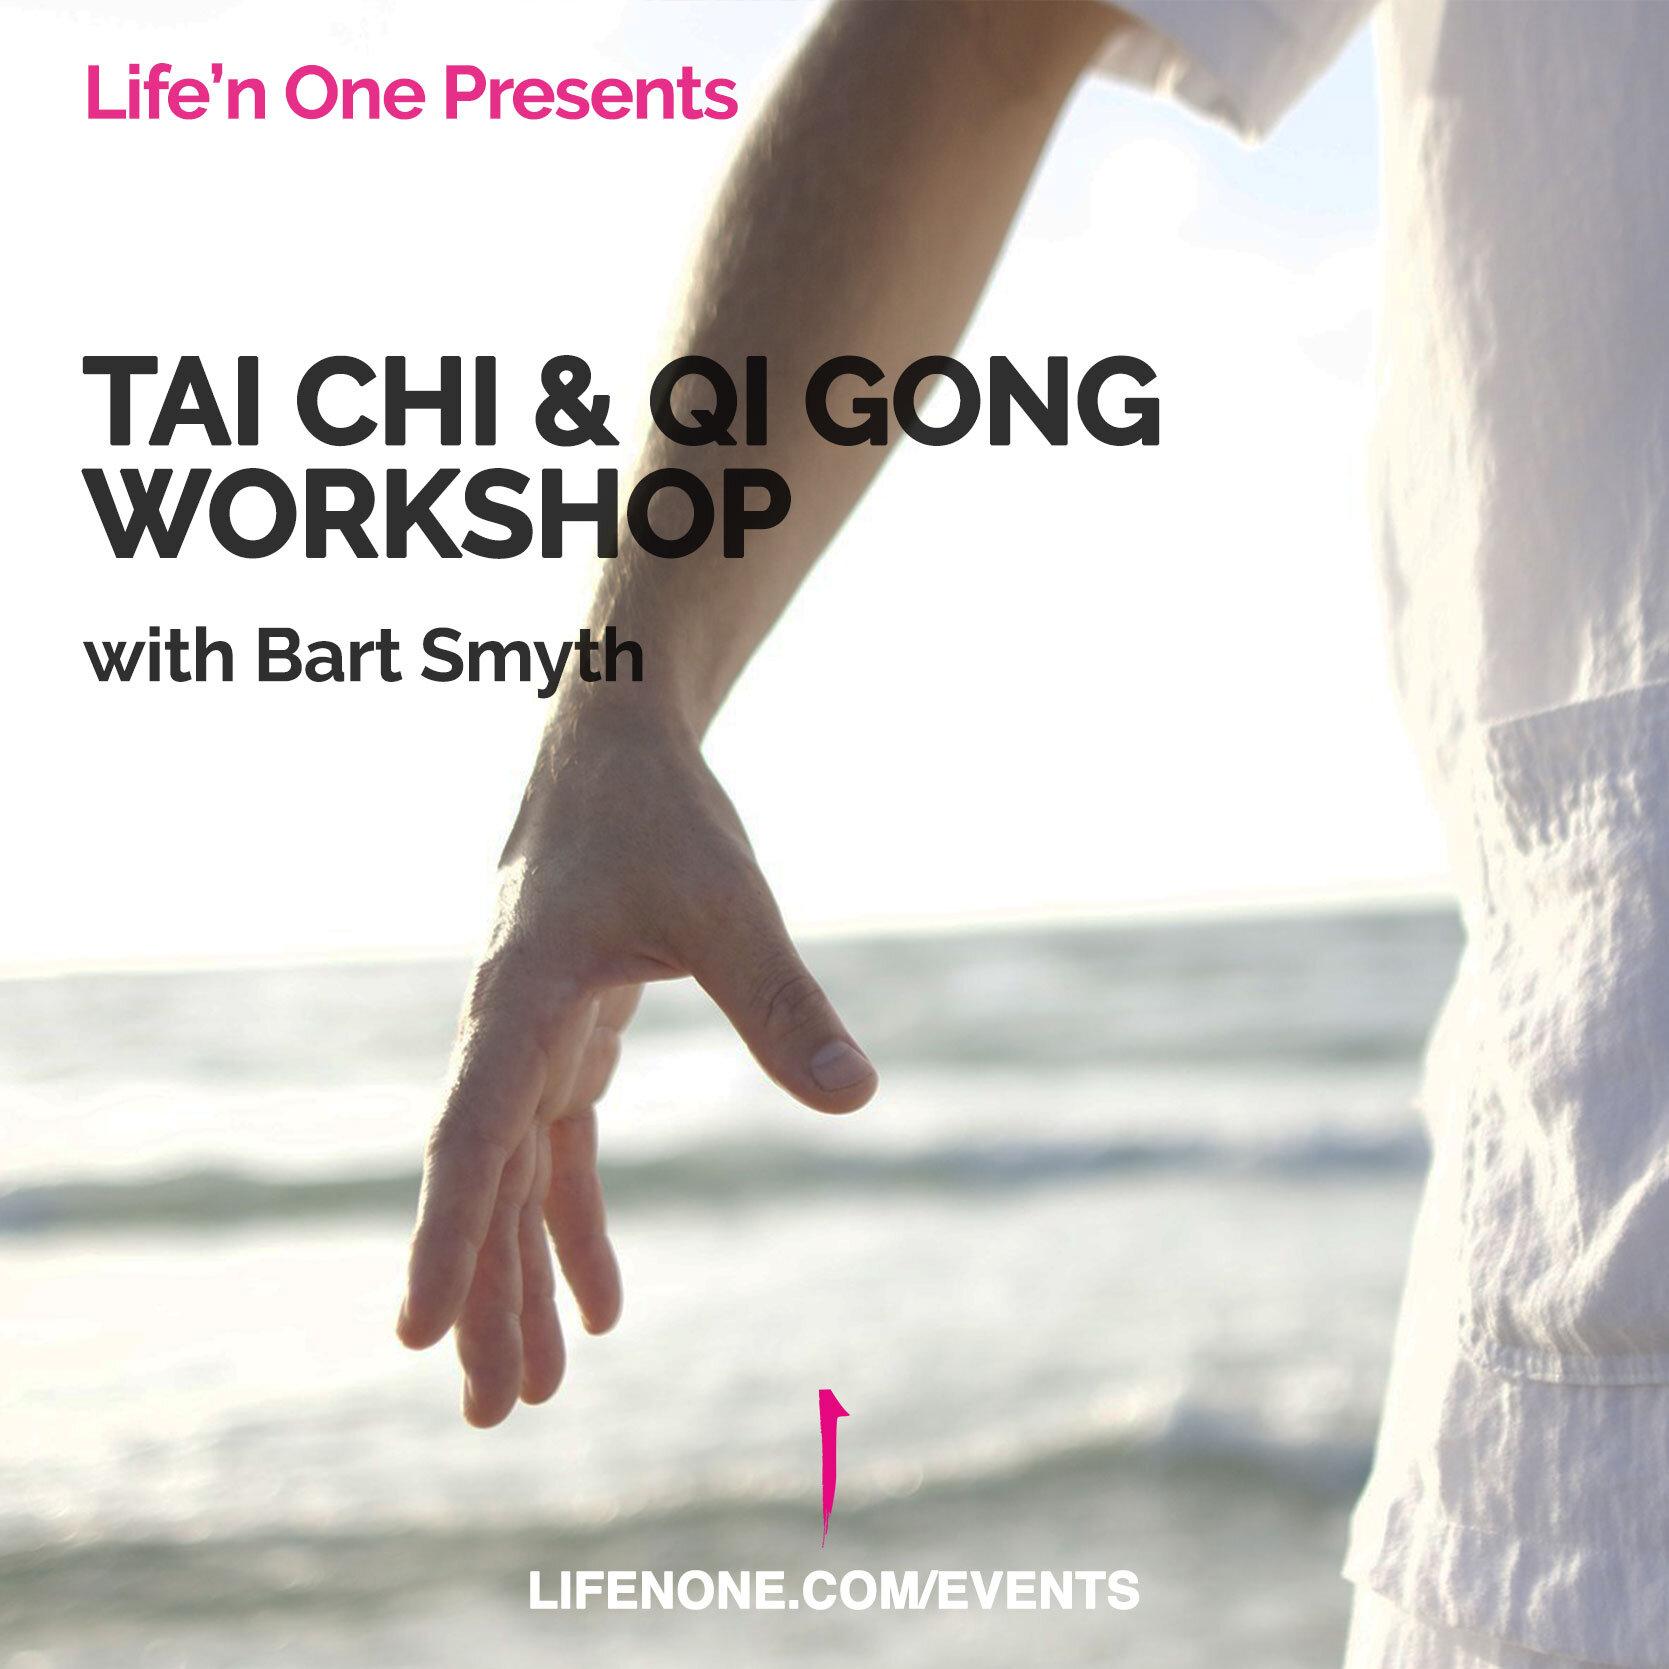 191116-tai-chi-&-qi-gong-workshop-with-Bart.jpg